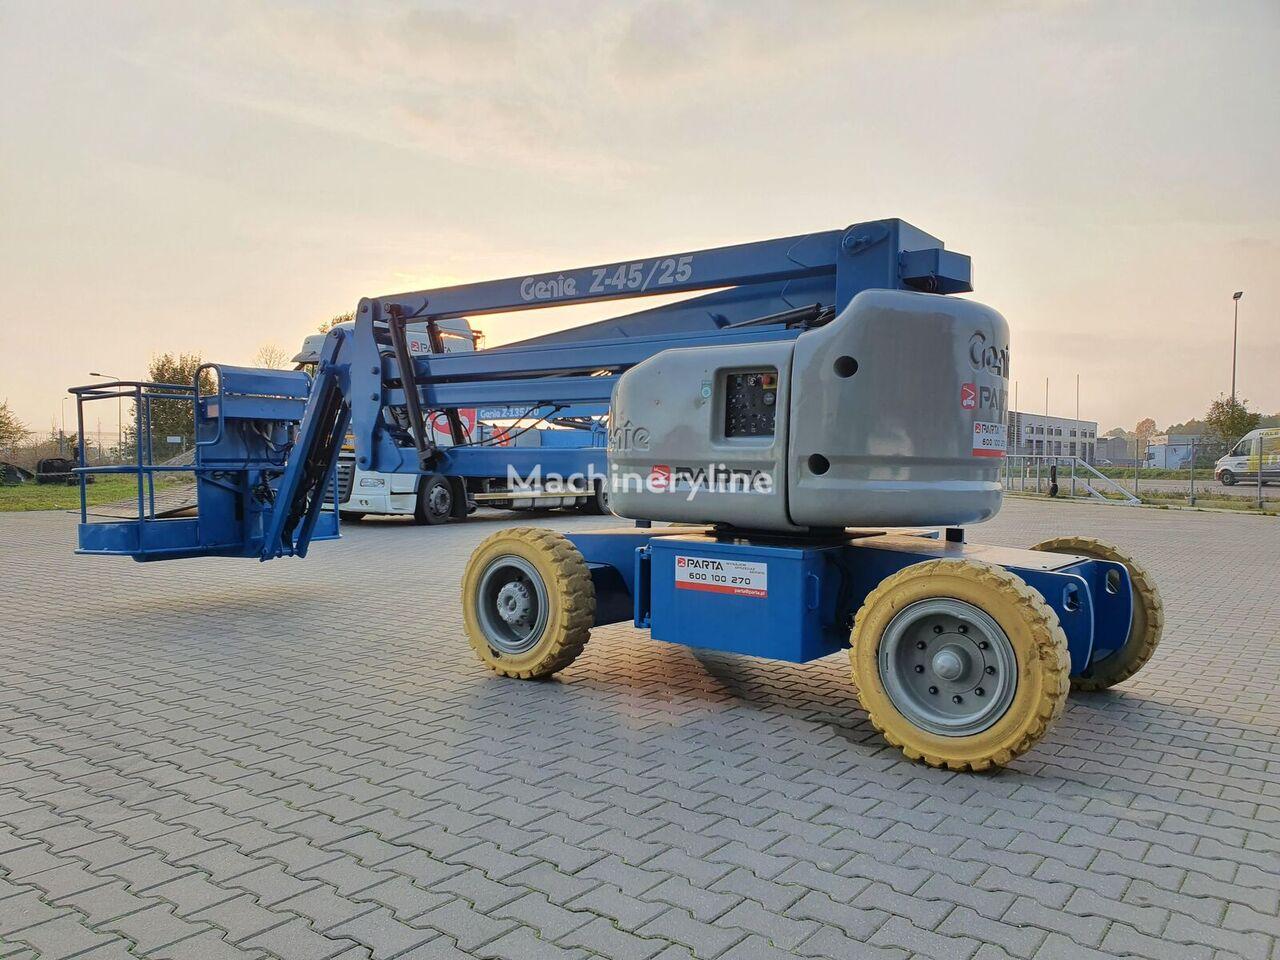 GENIE Z45/25 DC articulated boom lift